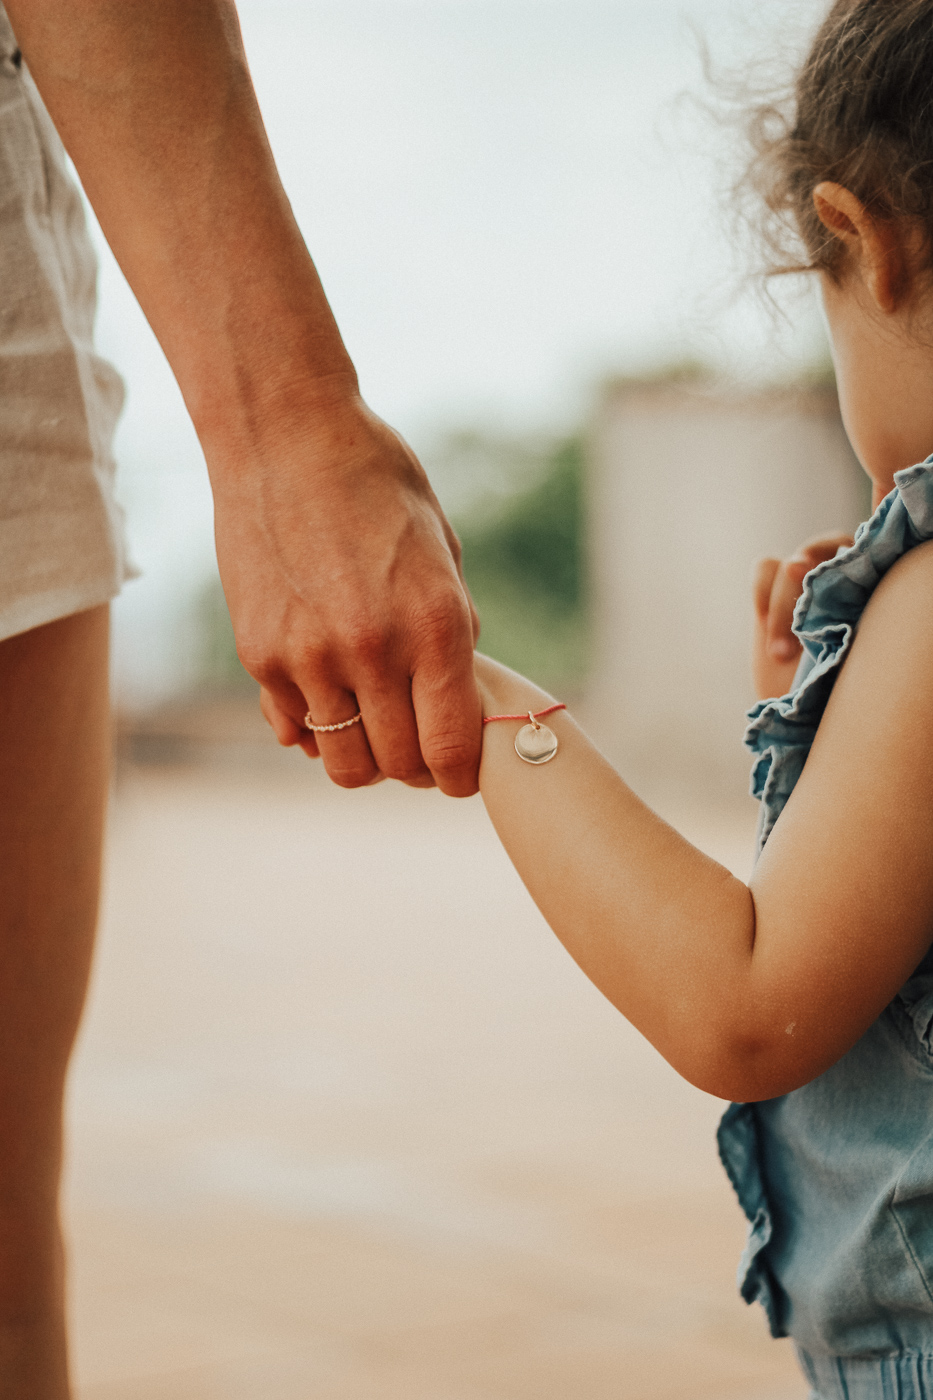 Mädchenmama, Hand in Hand